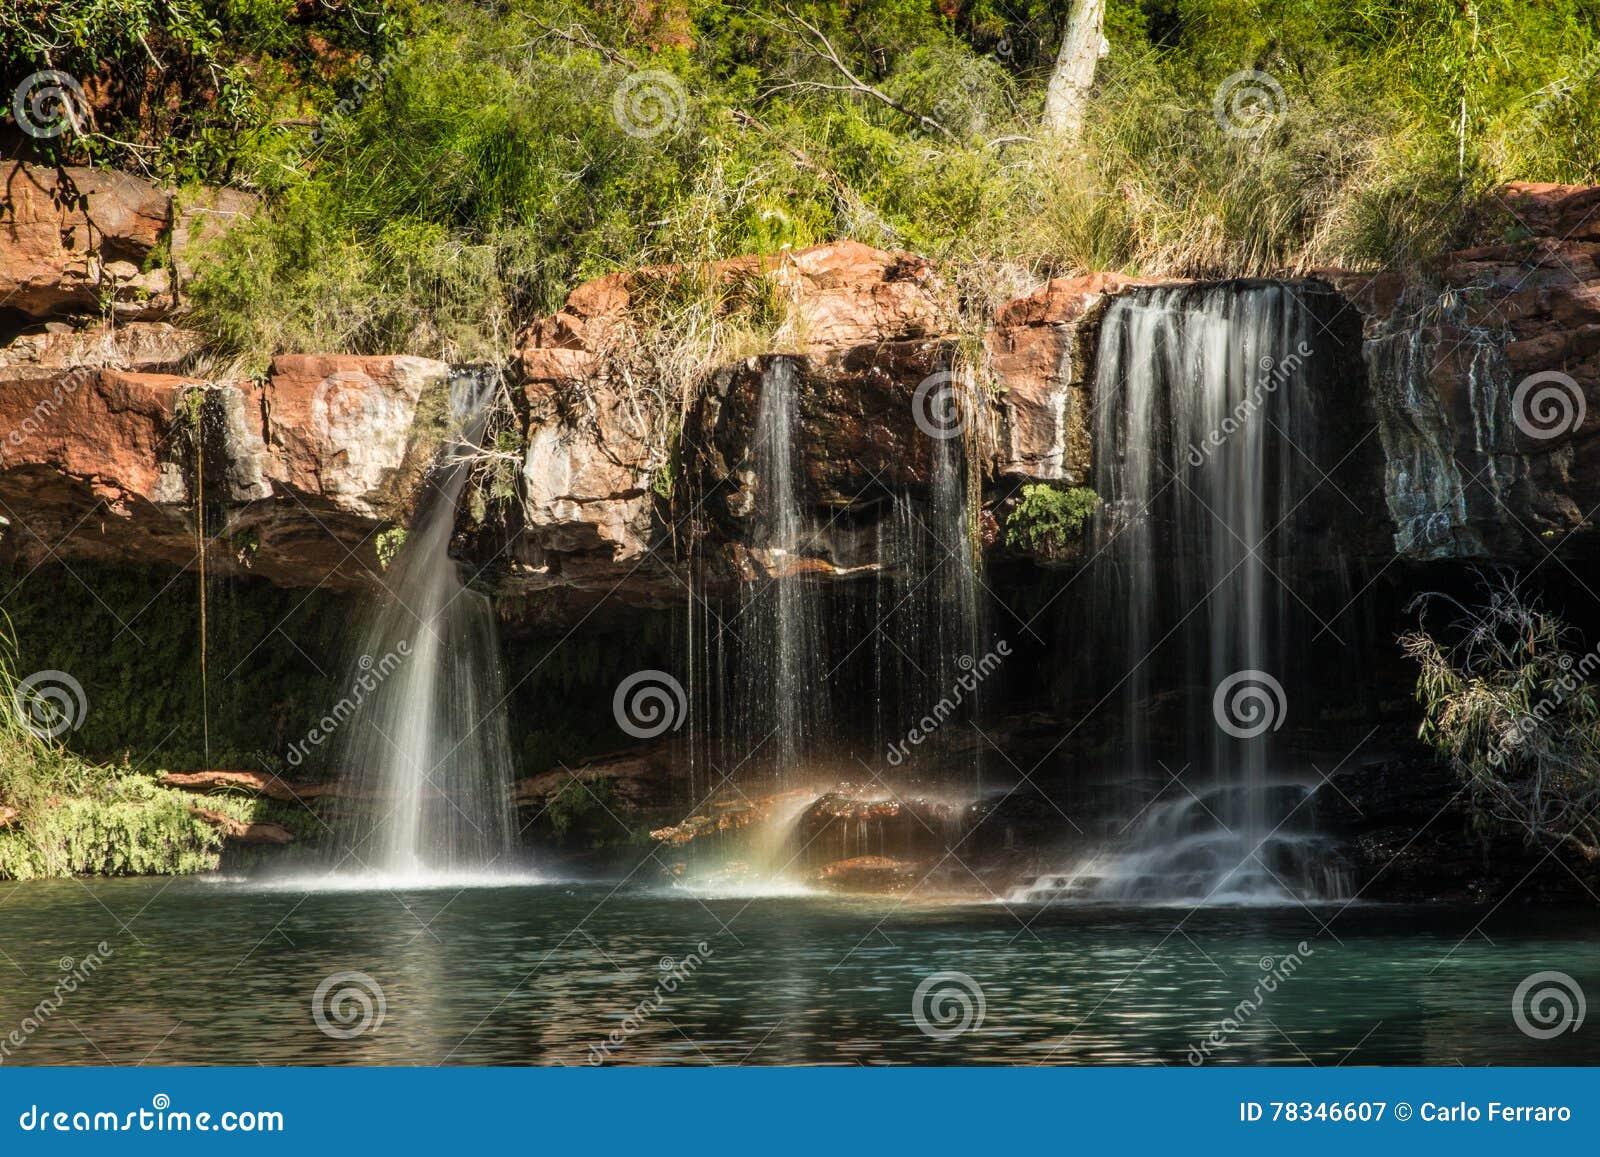 Dales Gorge, falls, Karijini National Park